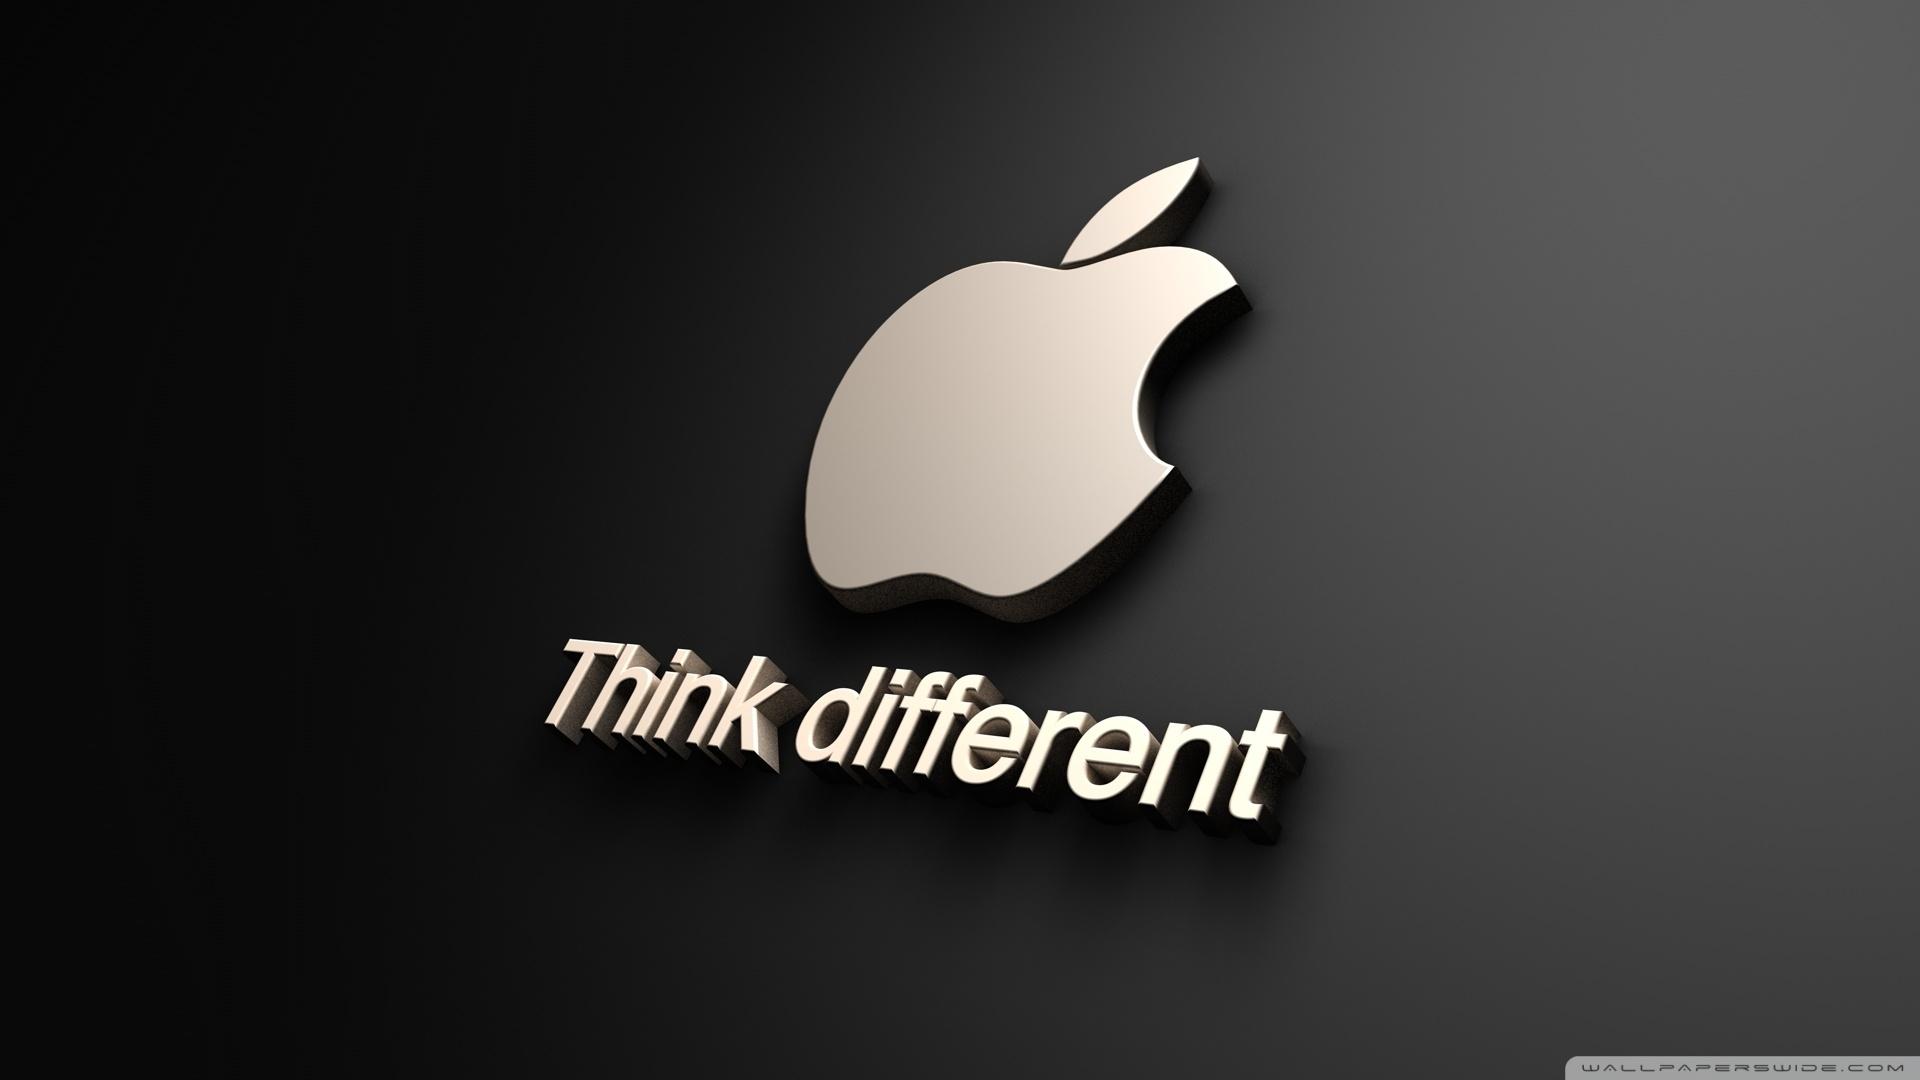 apple think different ❤ 4k hd desktop wallpaper for 4k ultra hd tv